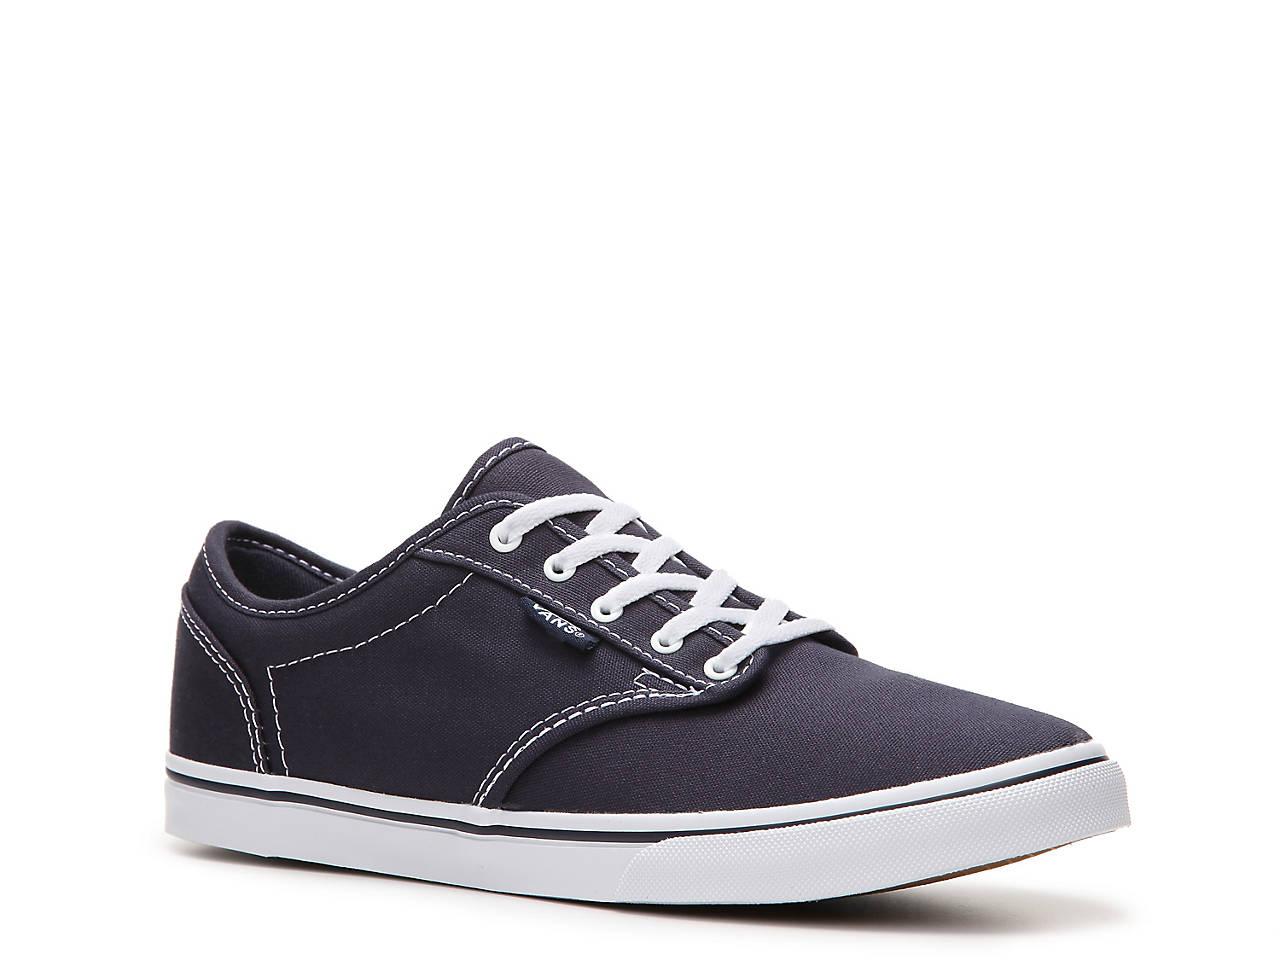 Vans Atwood Lo Sneaker - Women s Women s Shoes  898ed3836